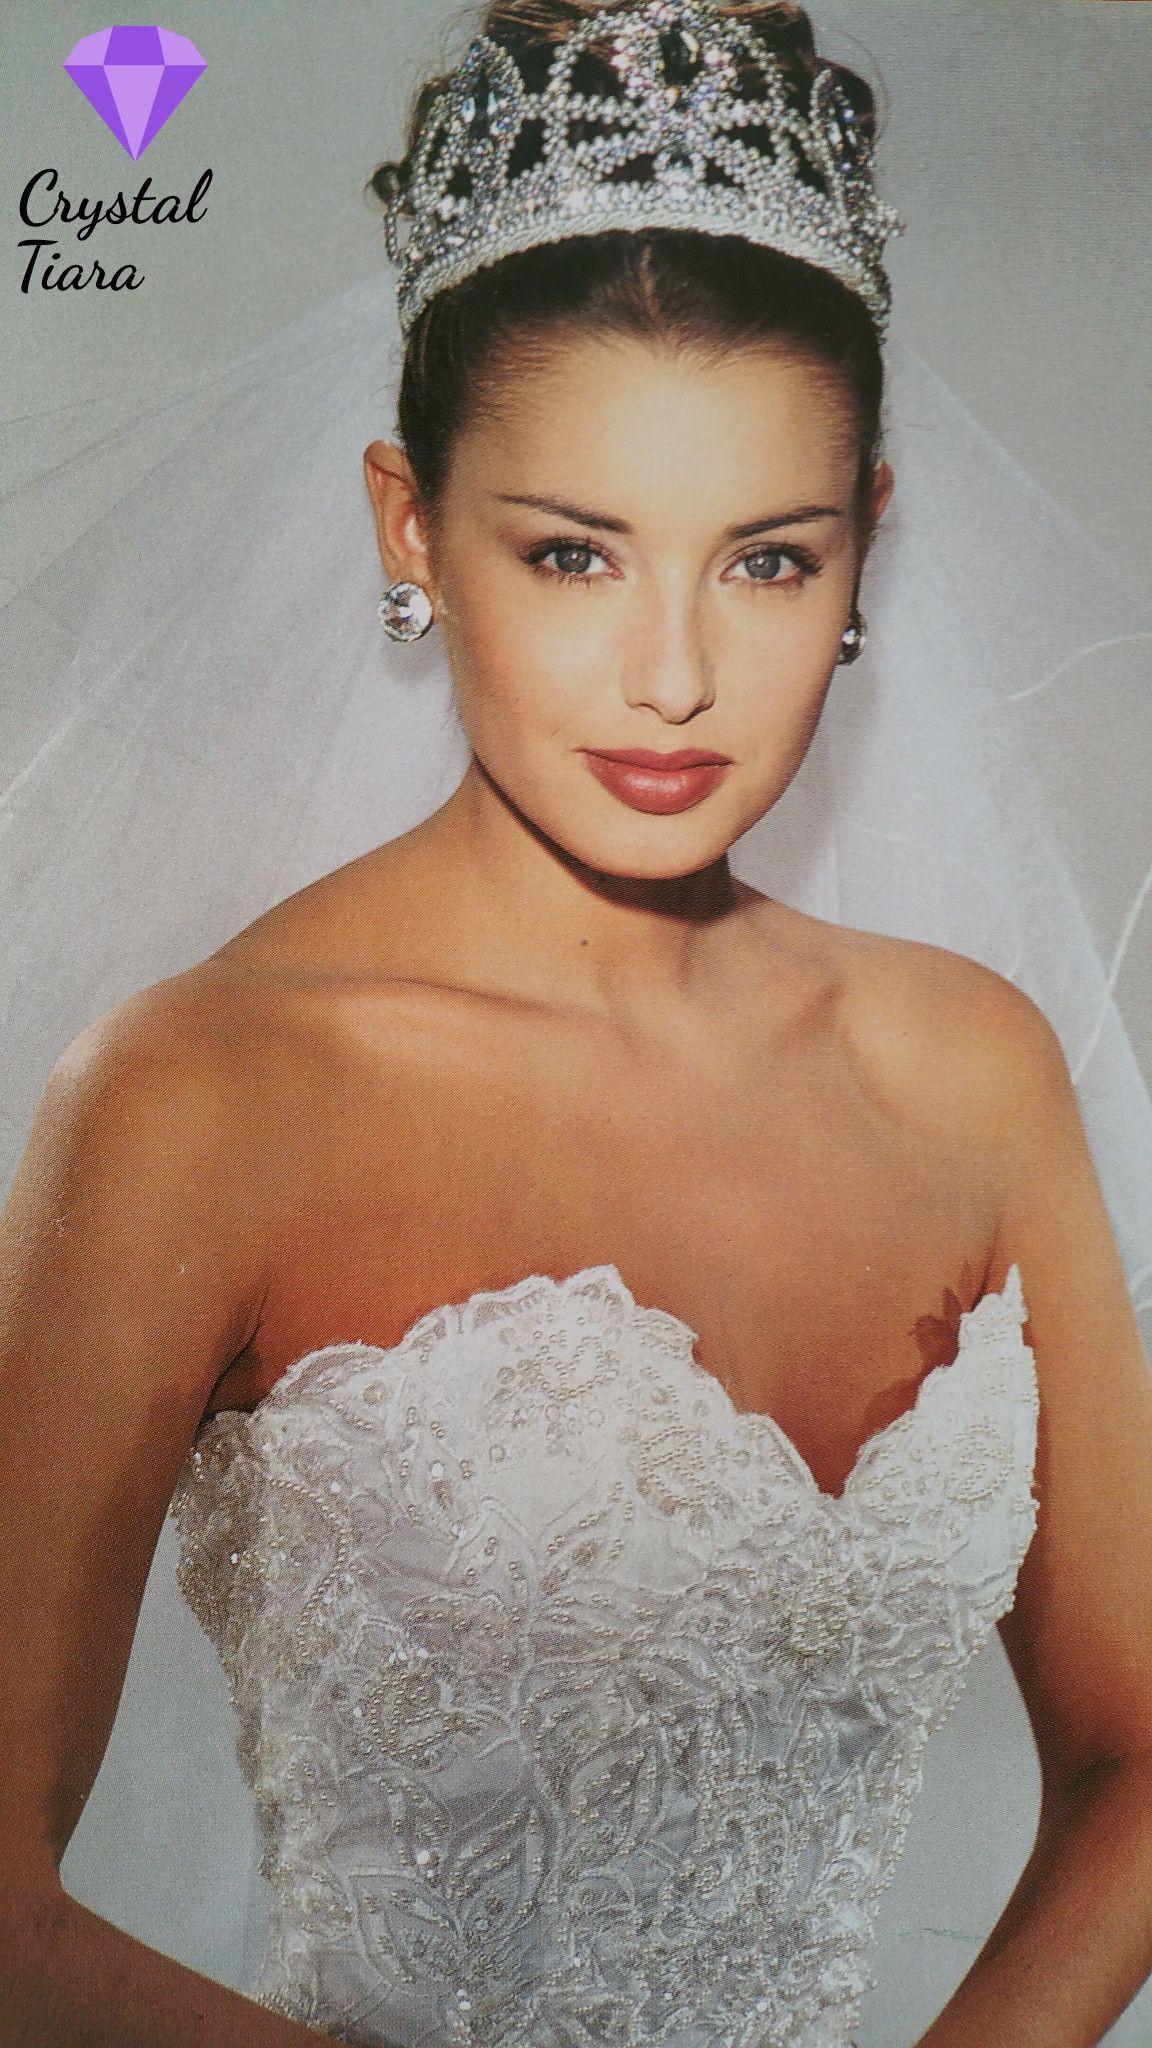 Demetrios Wedding Veils  Demetrios 1994 Crystal Tiara and a multi layered fingertip